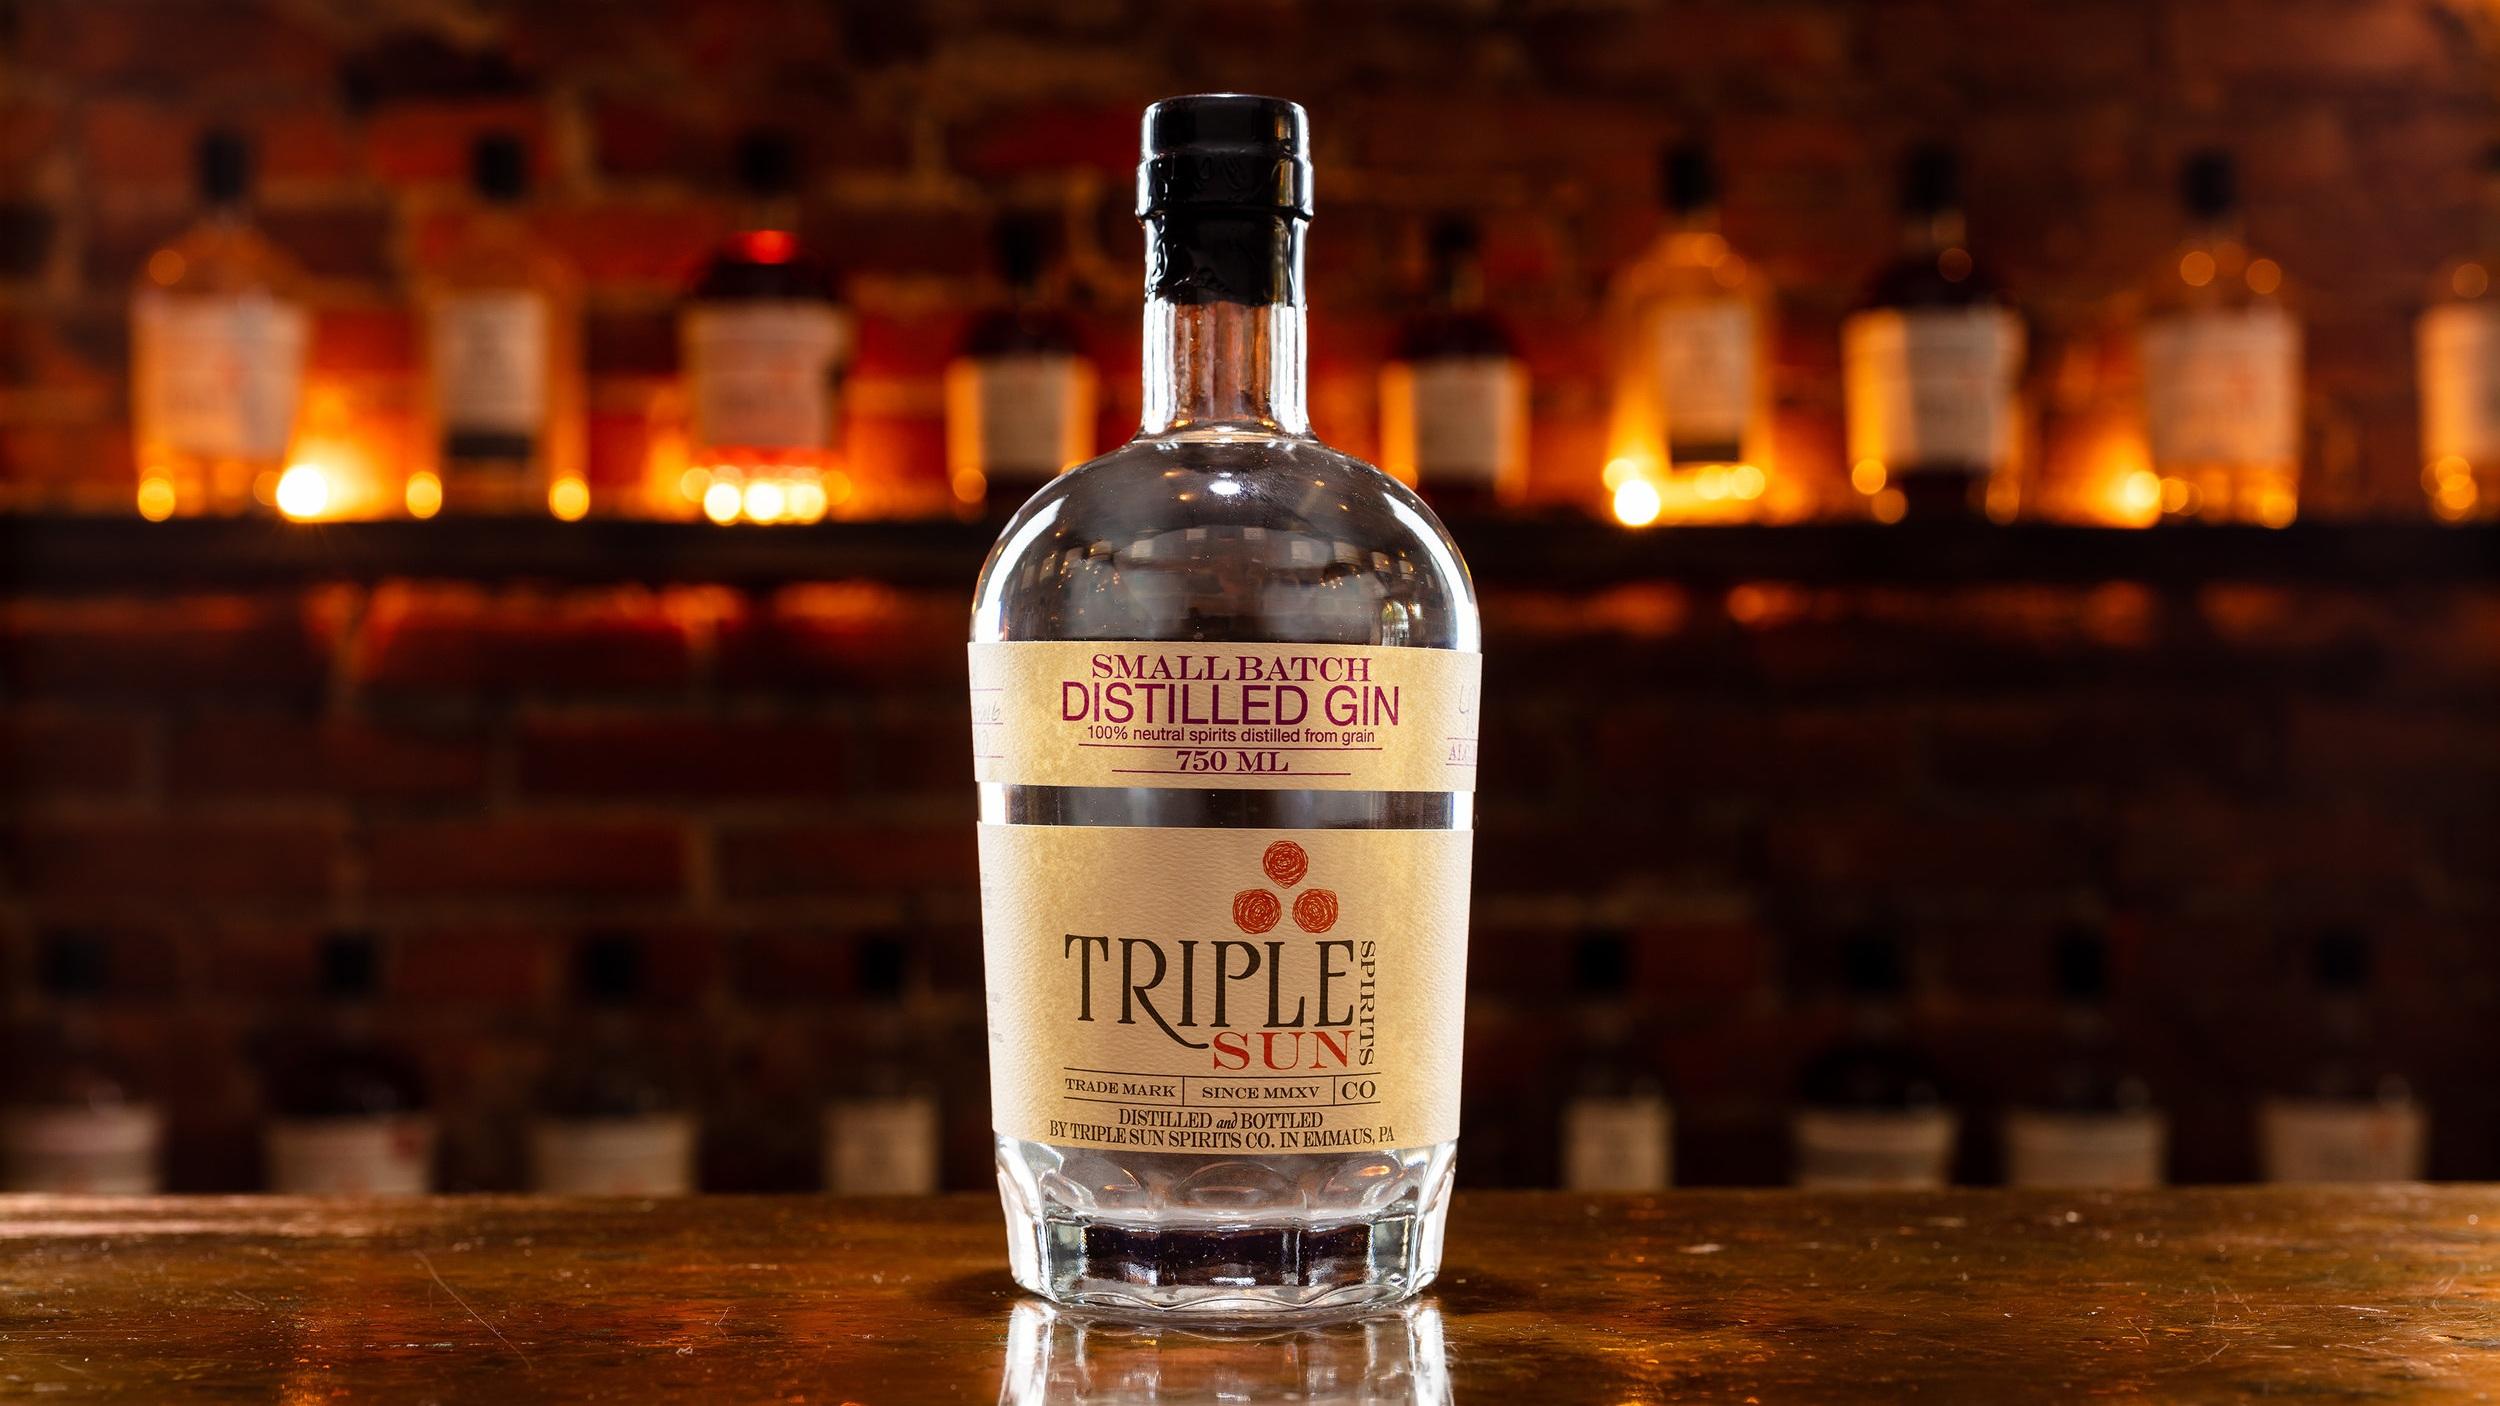 American Distilled Gin